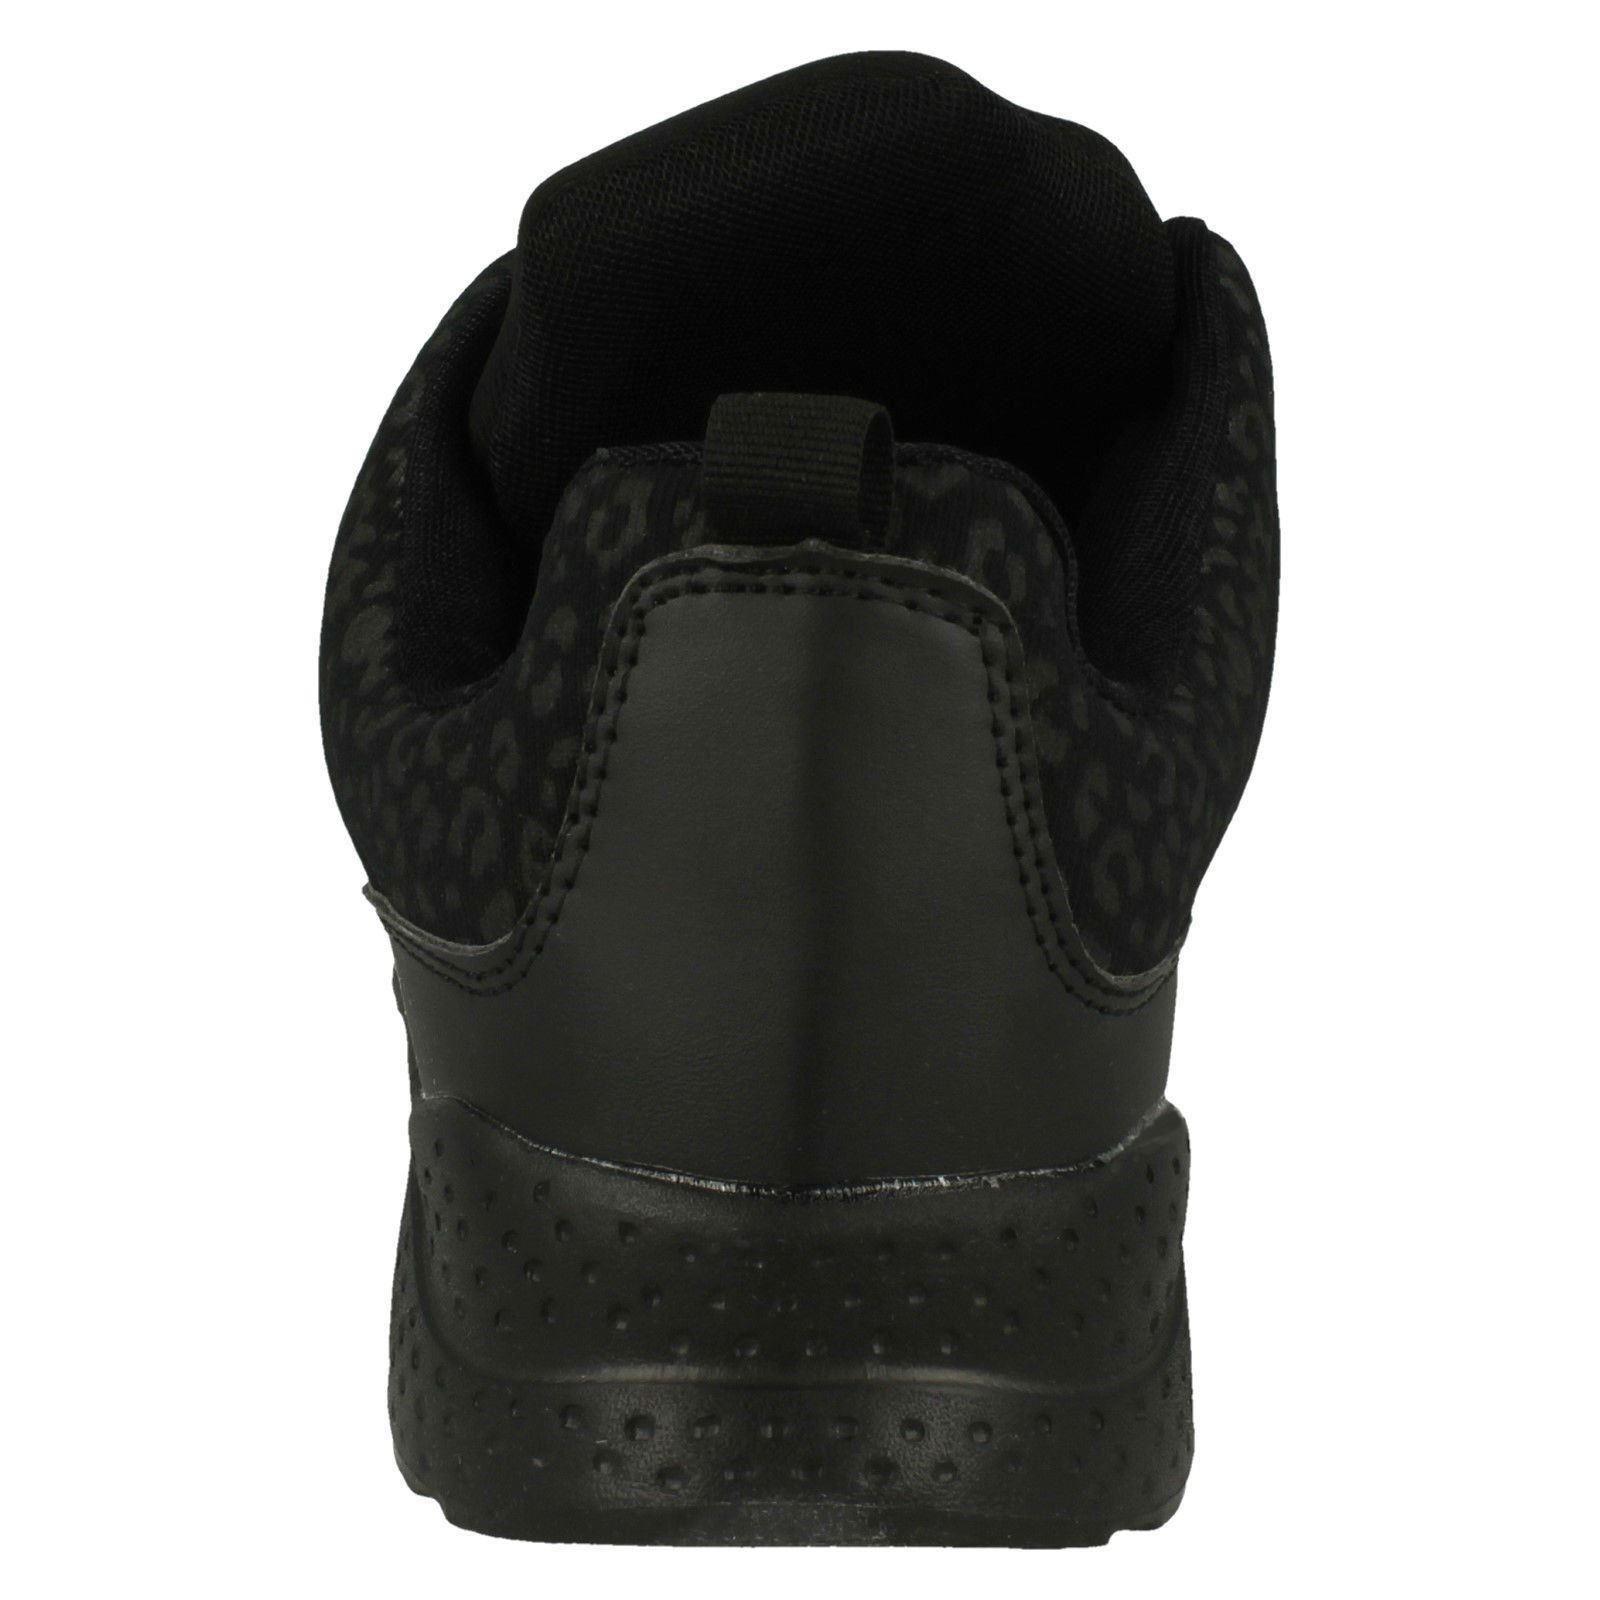 lace New Hommes Jersey Up Baskets Airtech Noir Zw75x7Rg